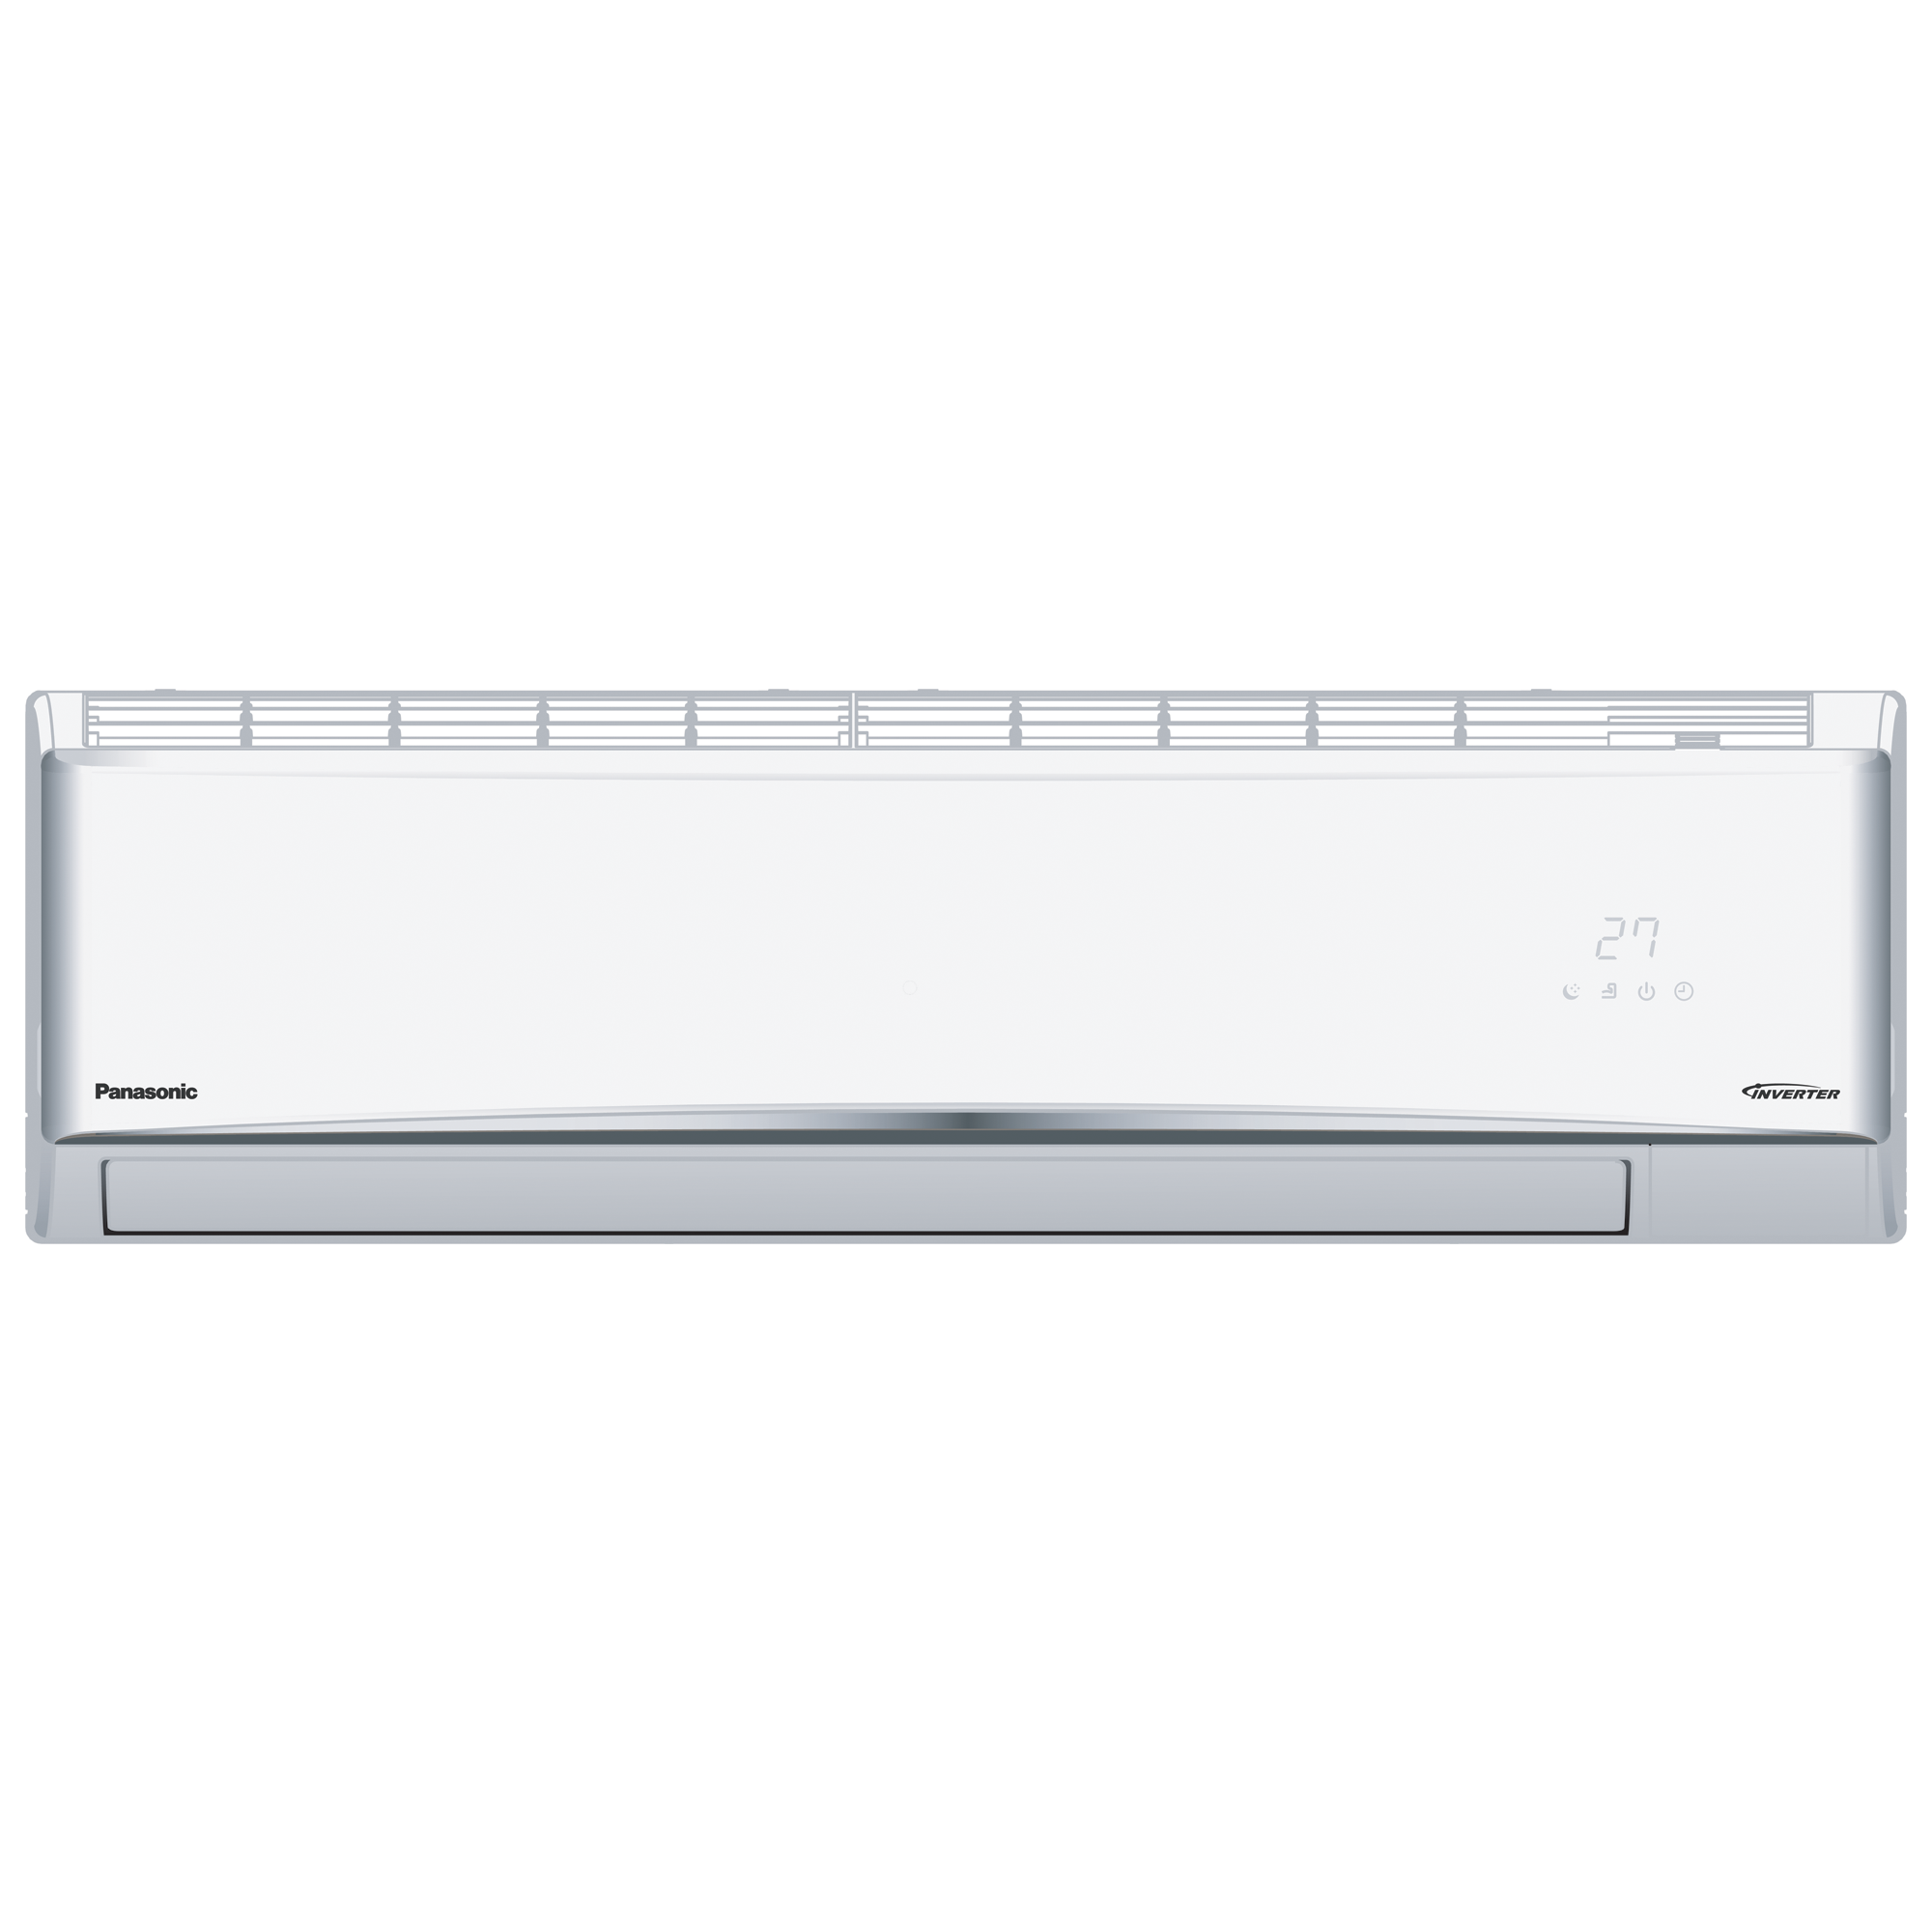 Panasonic ZU 1 Ton 5 Star Inverter Split AC (Air Purification Filter, Copper Condenser, CS/CU-ZU12XKYF, White)_1